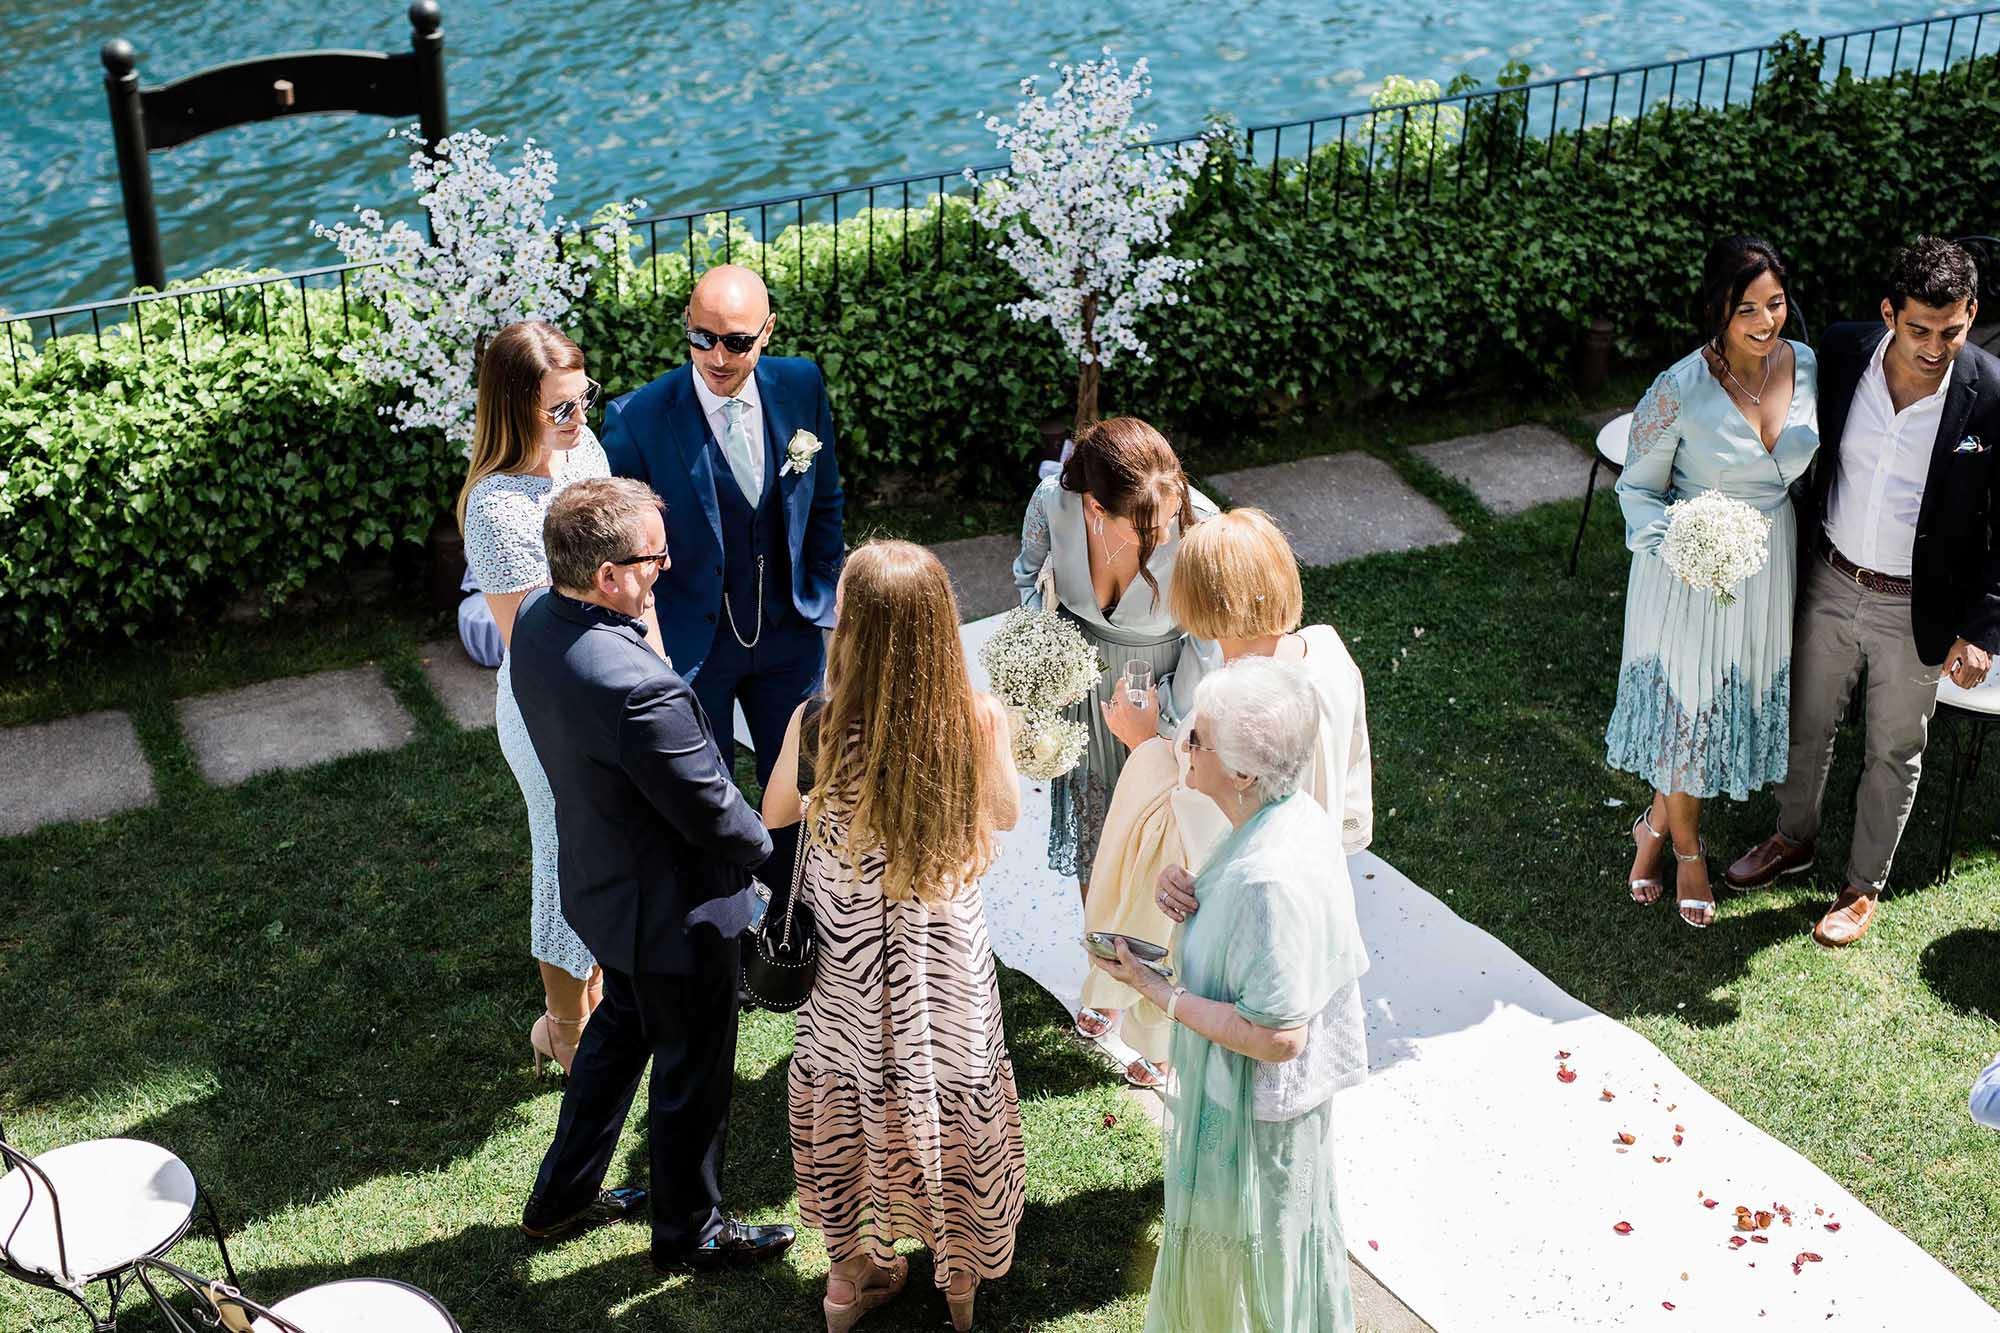 Your_Wedding_Day_178.jpg